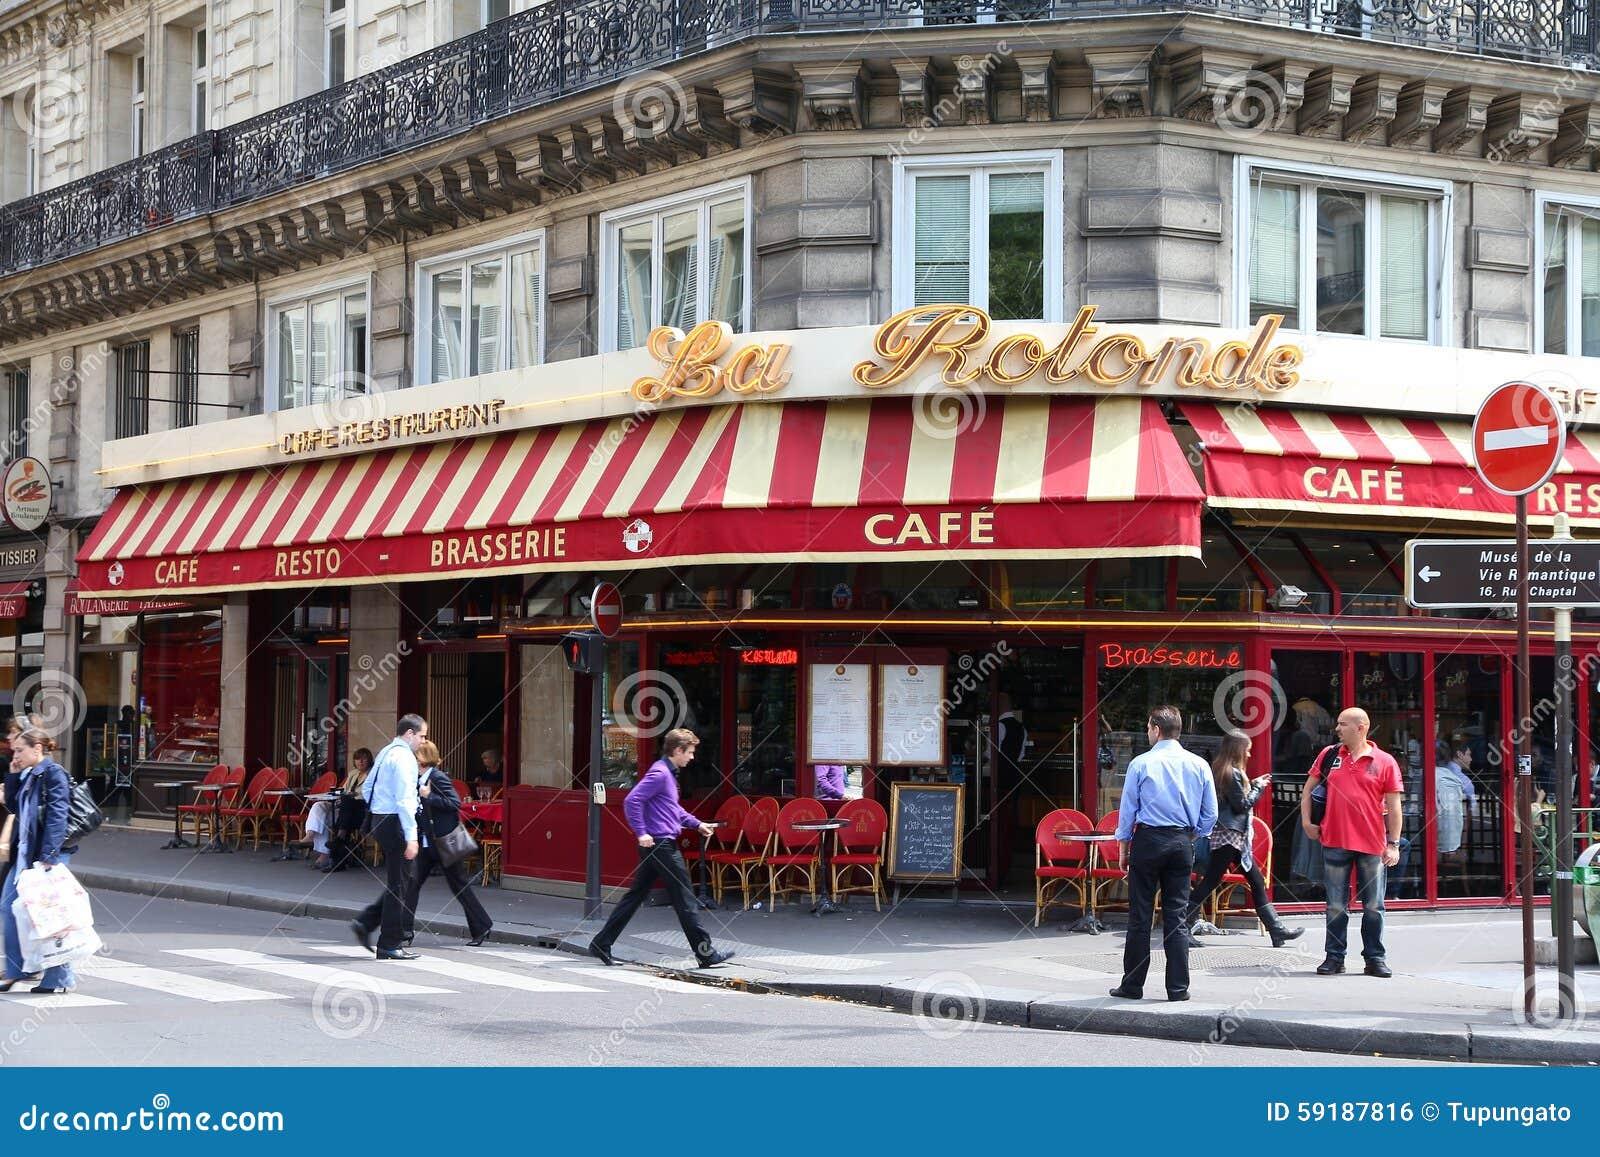 Caf de paris photo ditorial image 59187816 - Camif paris ...